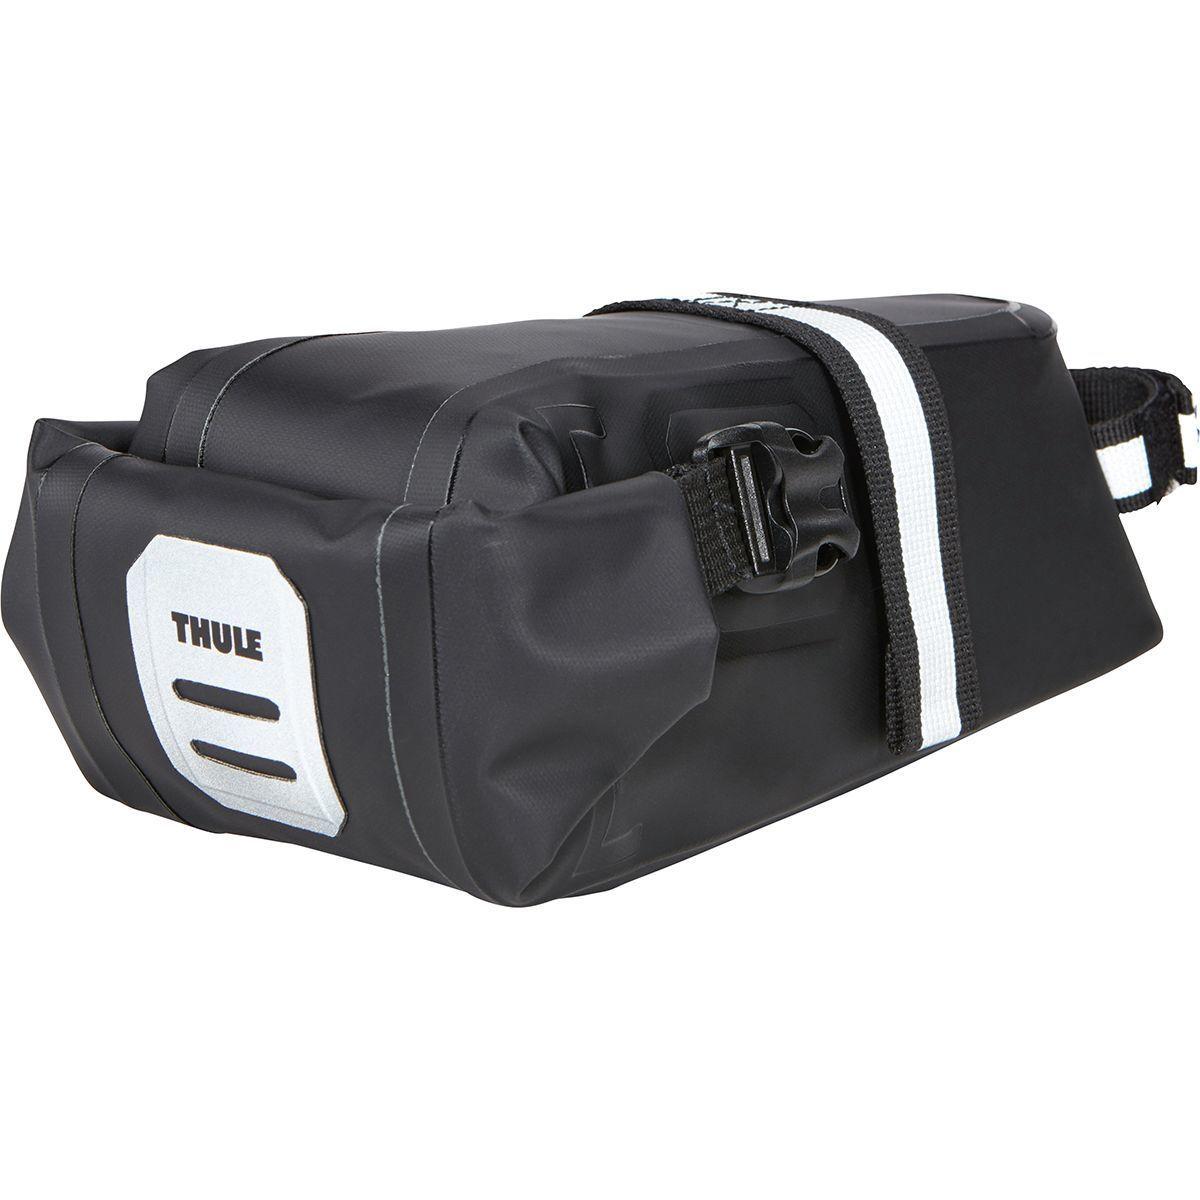 Thule Pack 'n Pedal Shield Seat Bag